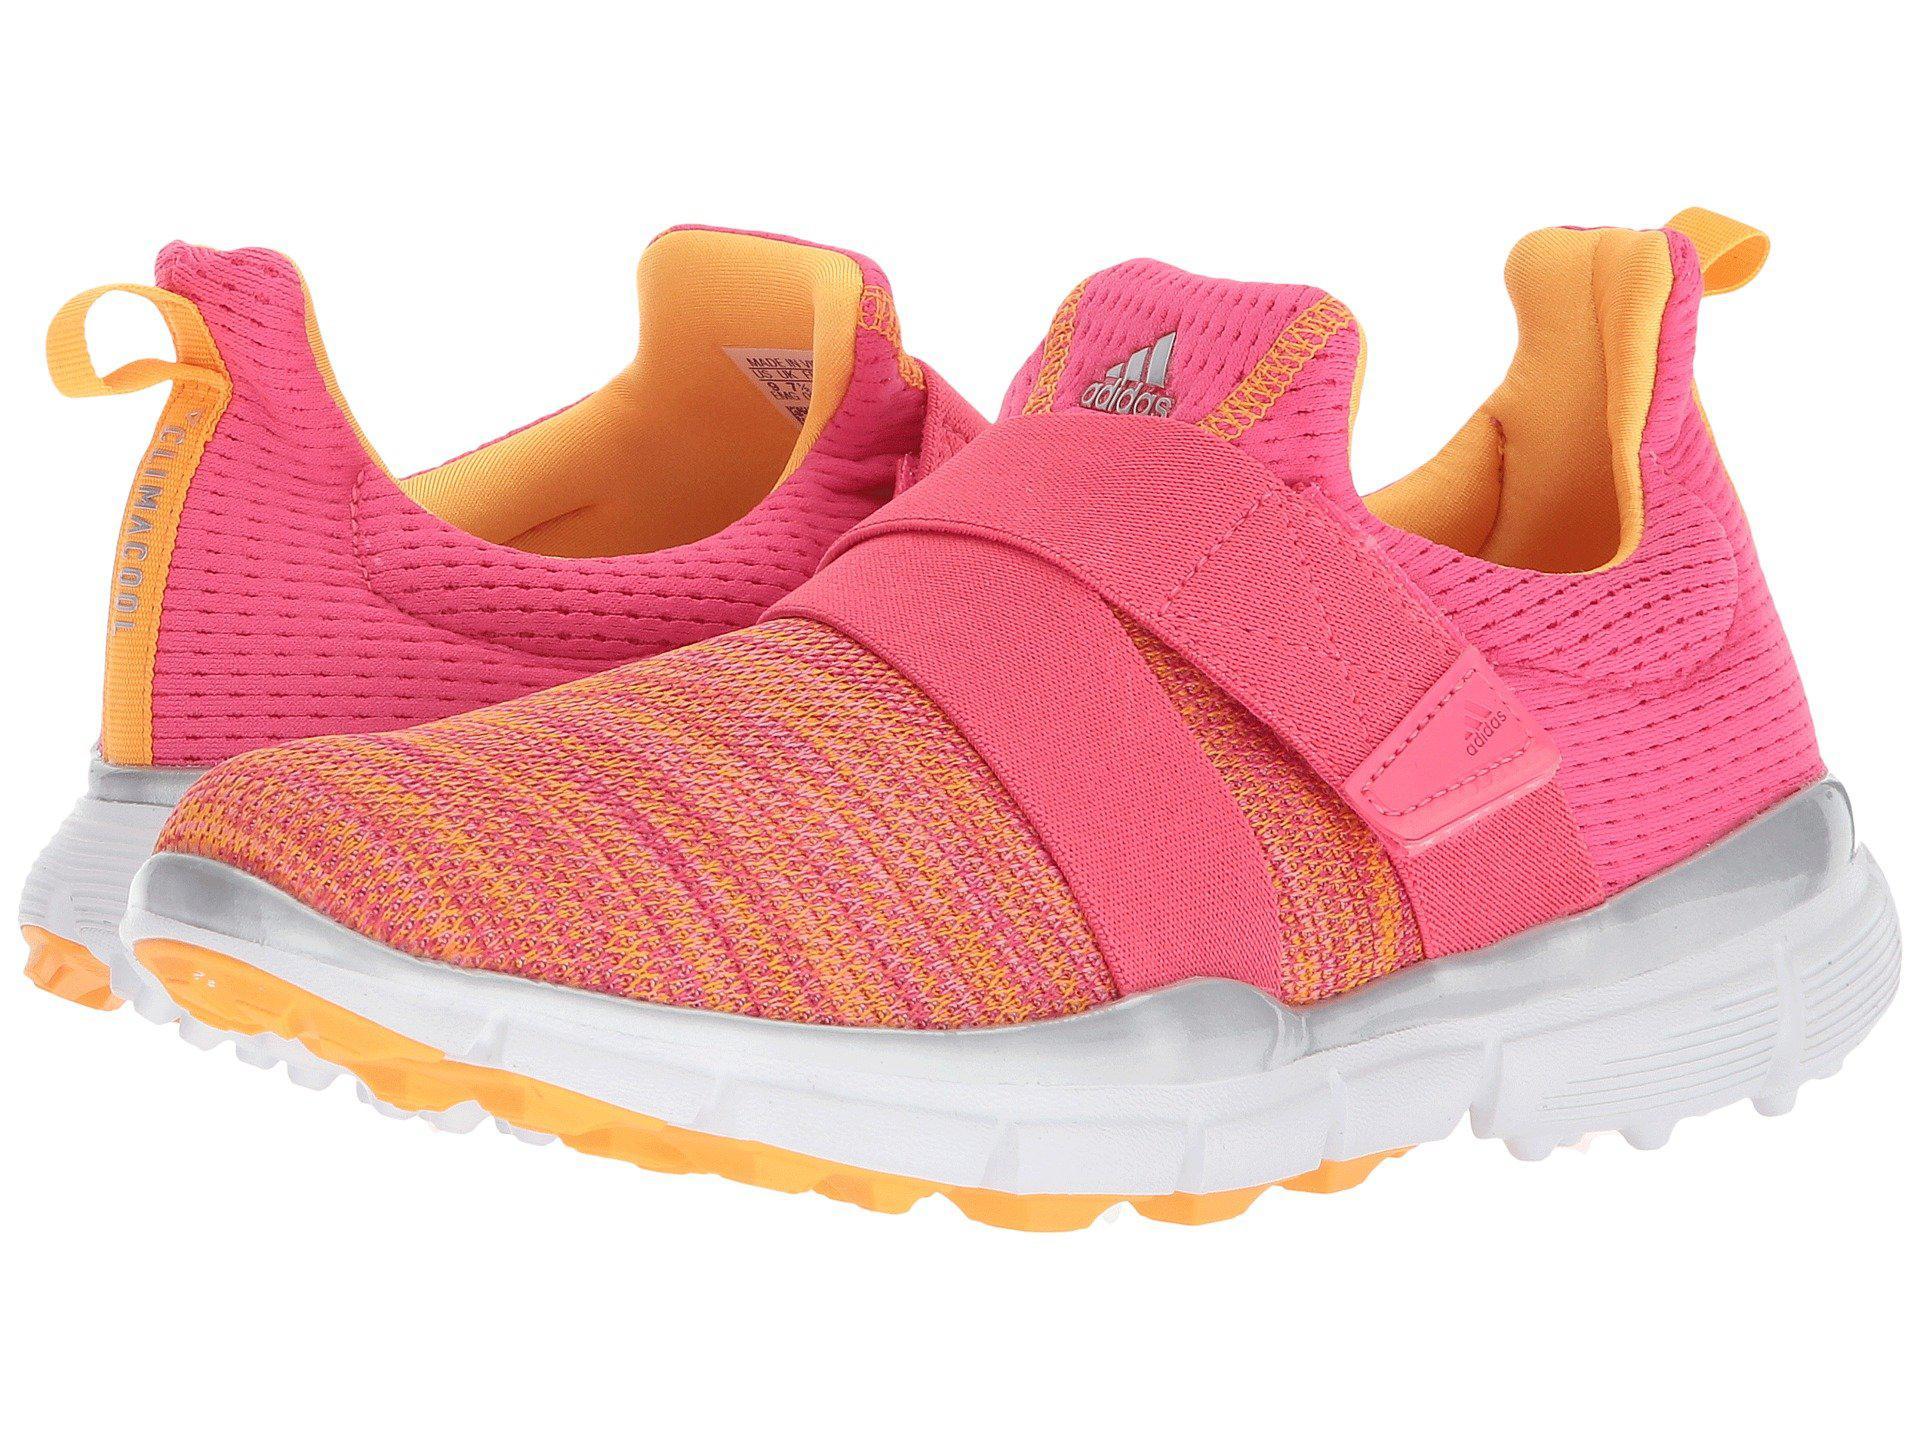 buy popular 0b19d f3998 ... huge selection of 8ef32 a0a42 Adidas Originals - Pink Climacool Knit -  Lyst. View fullscreen